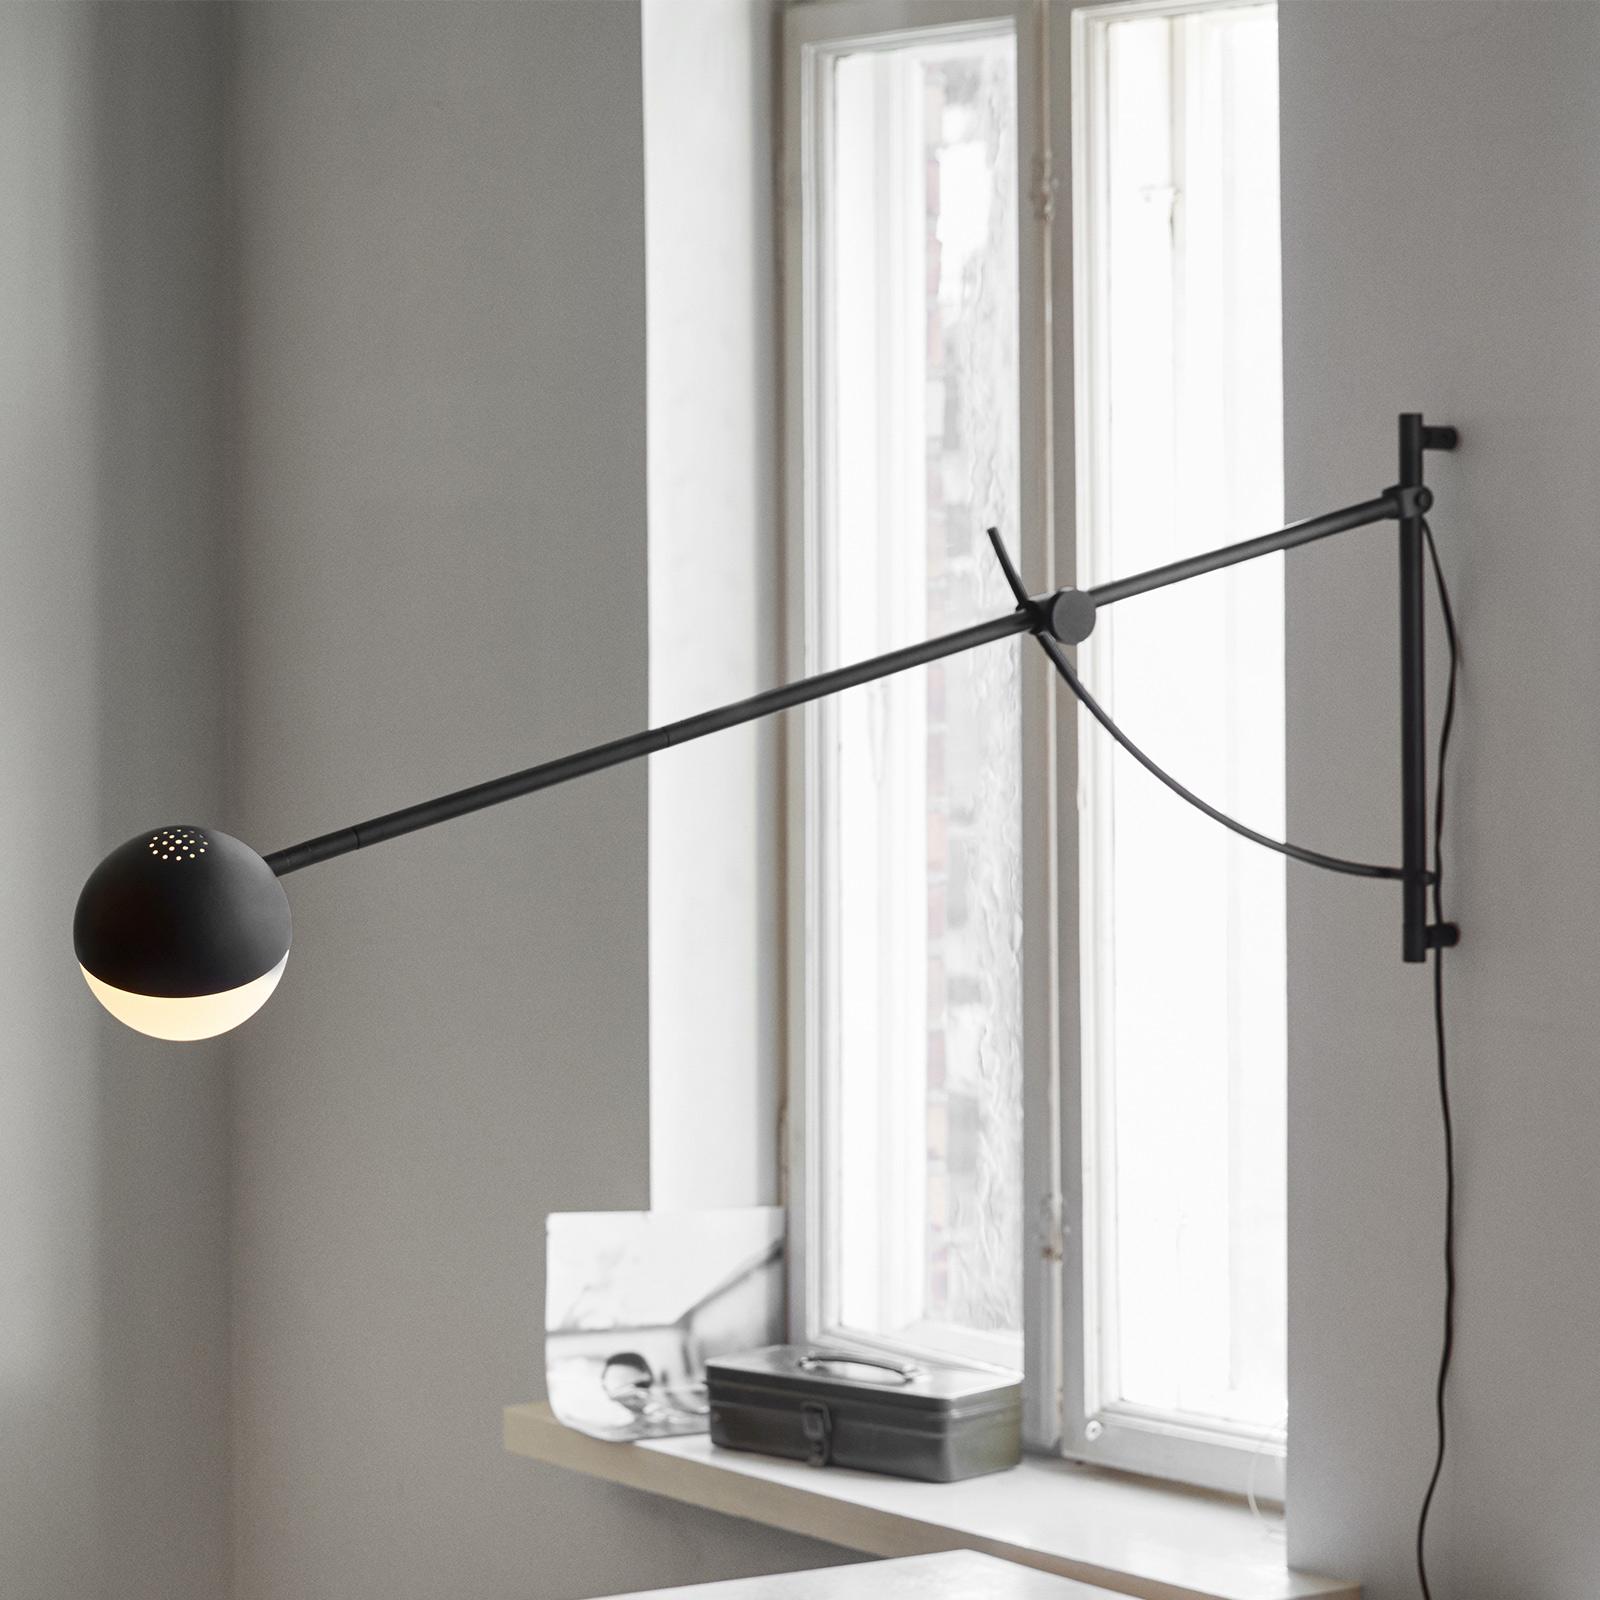 Northern Balancer wandlamp, zwart